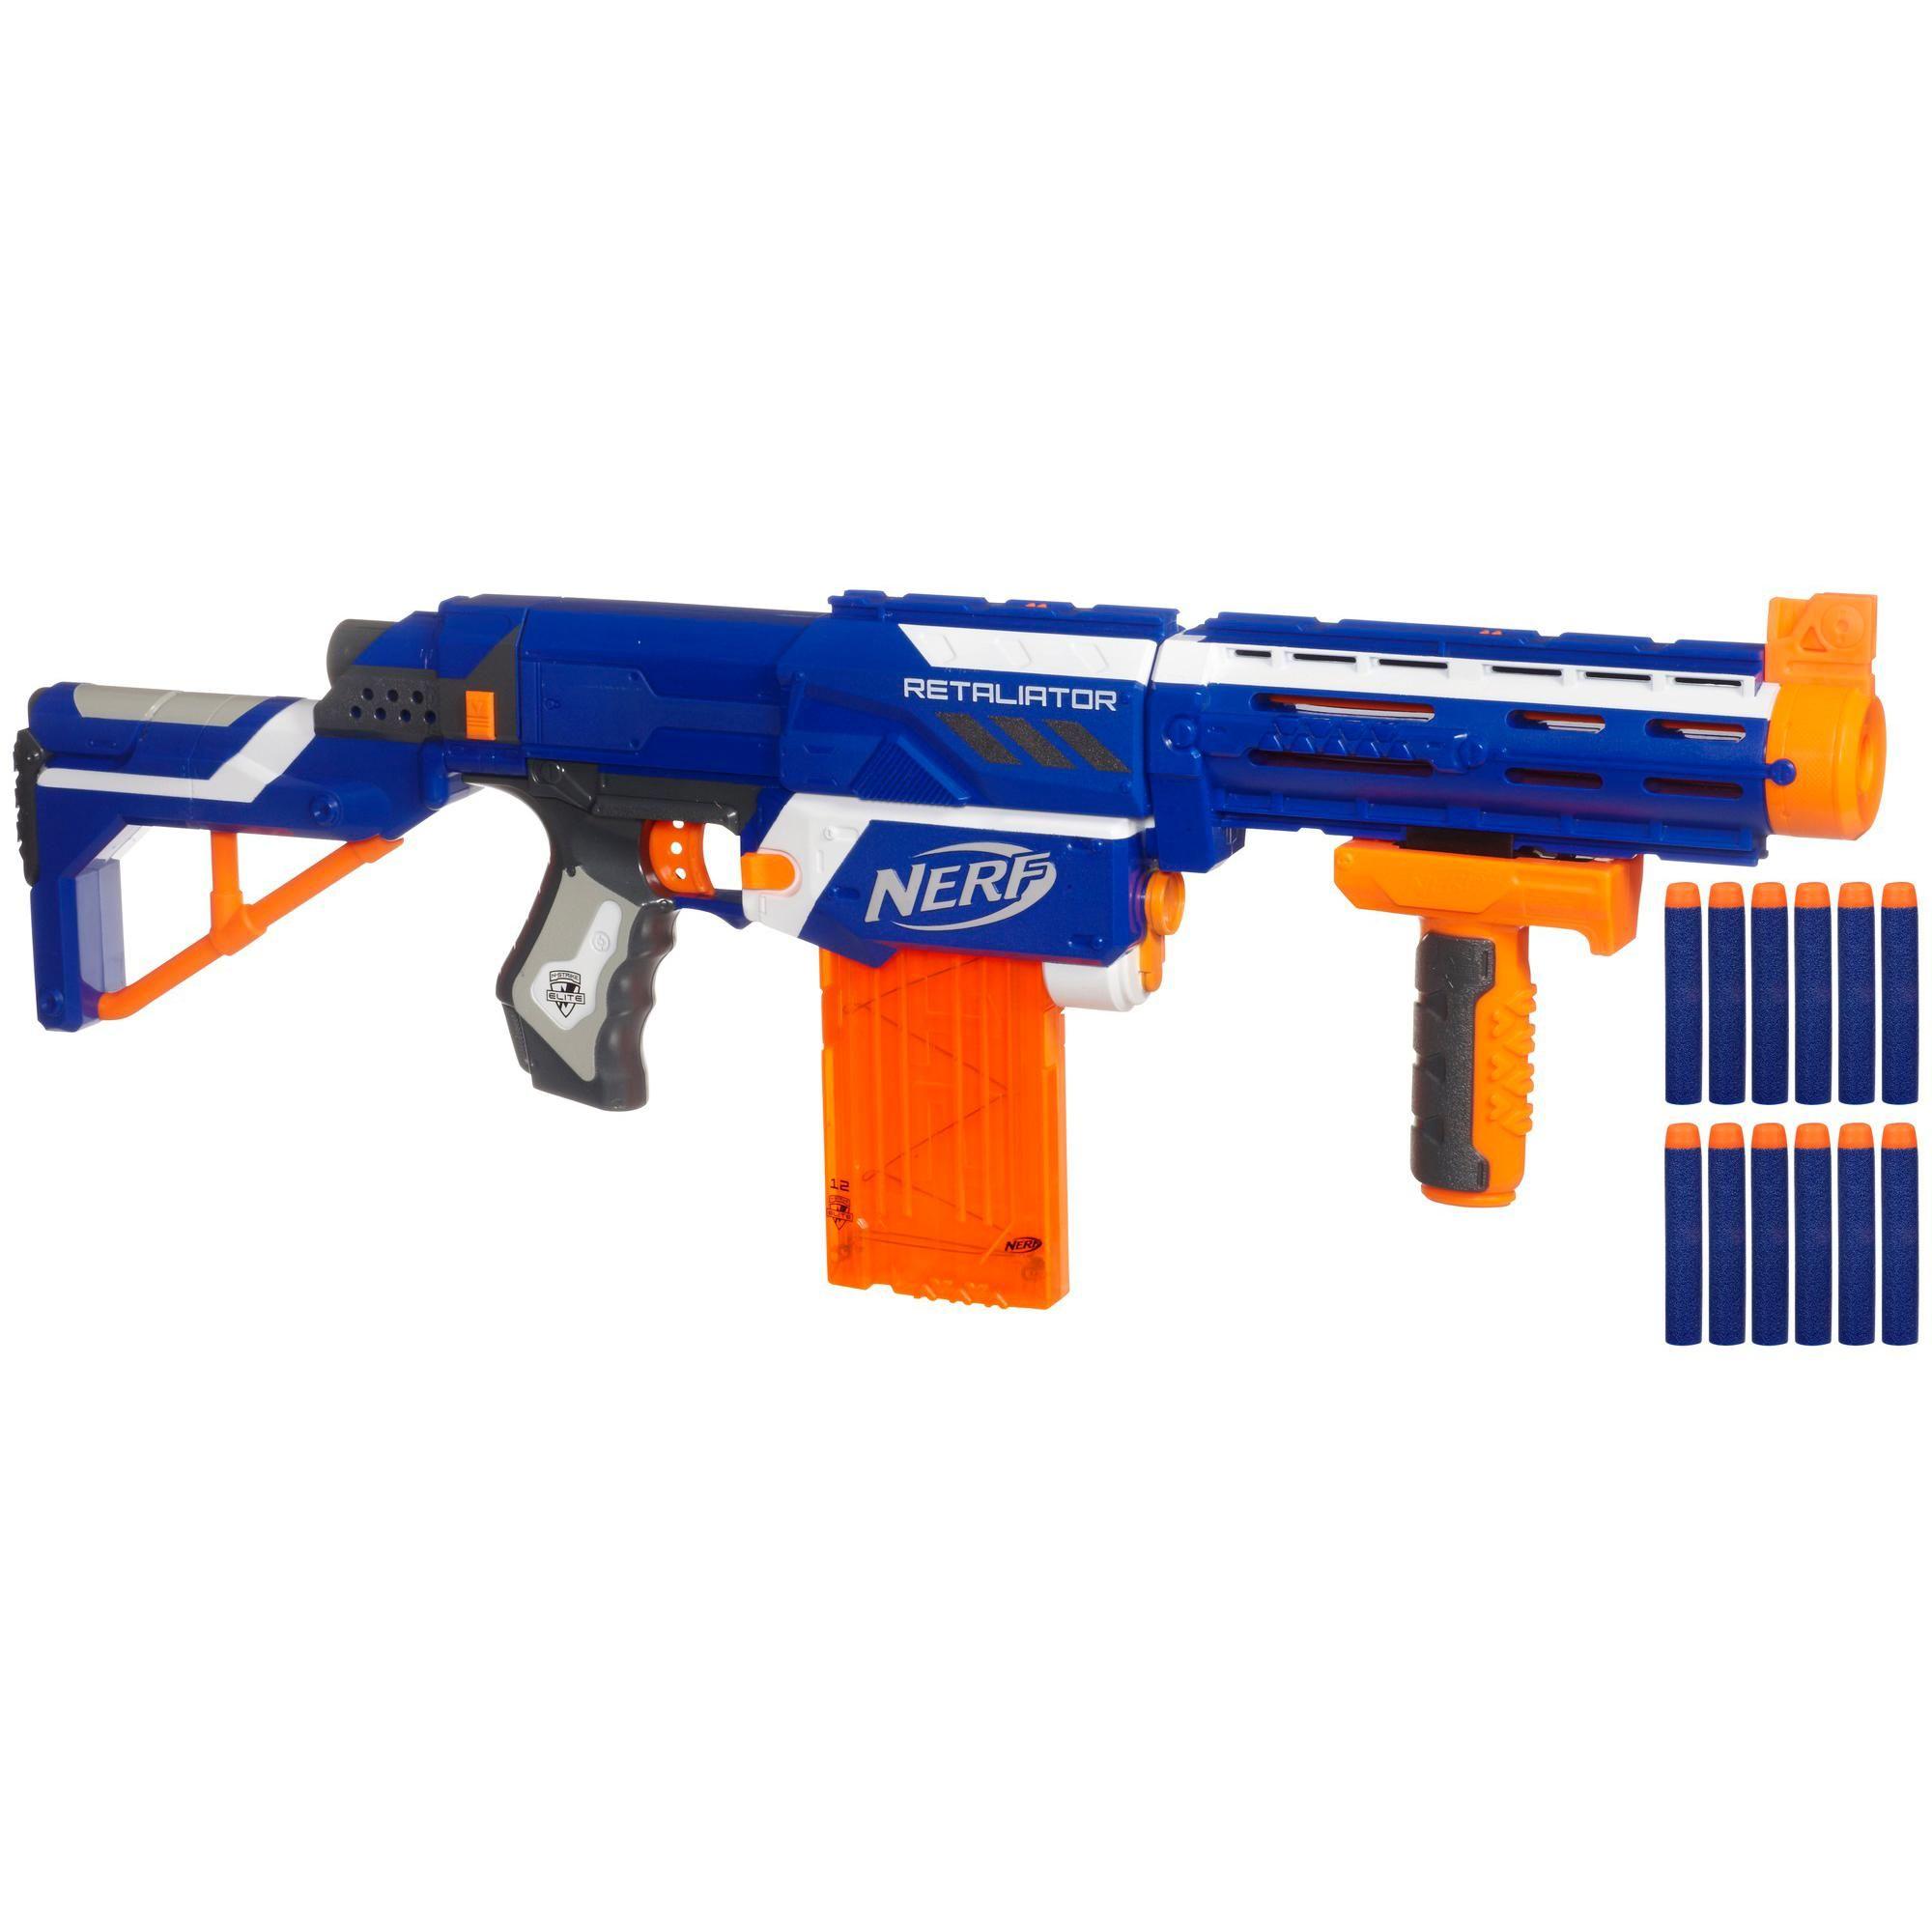 Nerf nstrike elite retaliator blaster colors